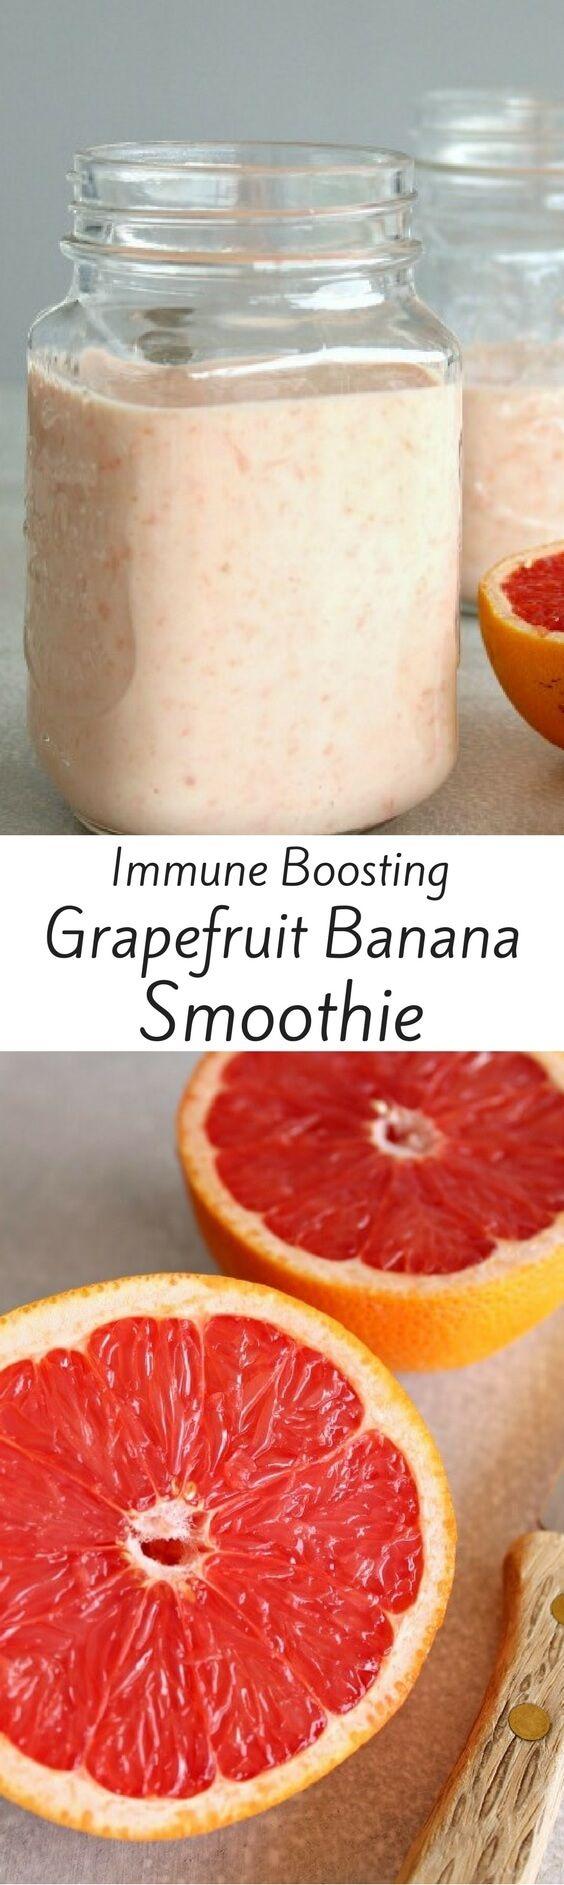 Grapefruit and Banana Smoothie